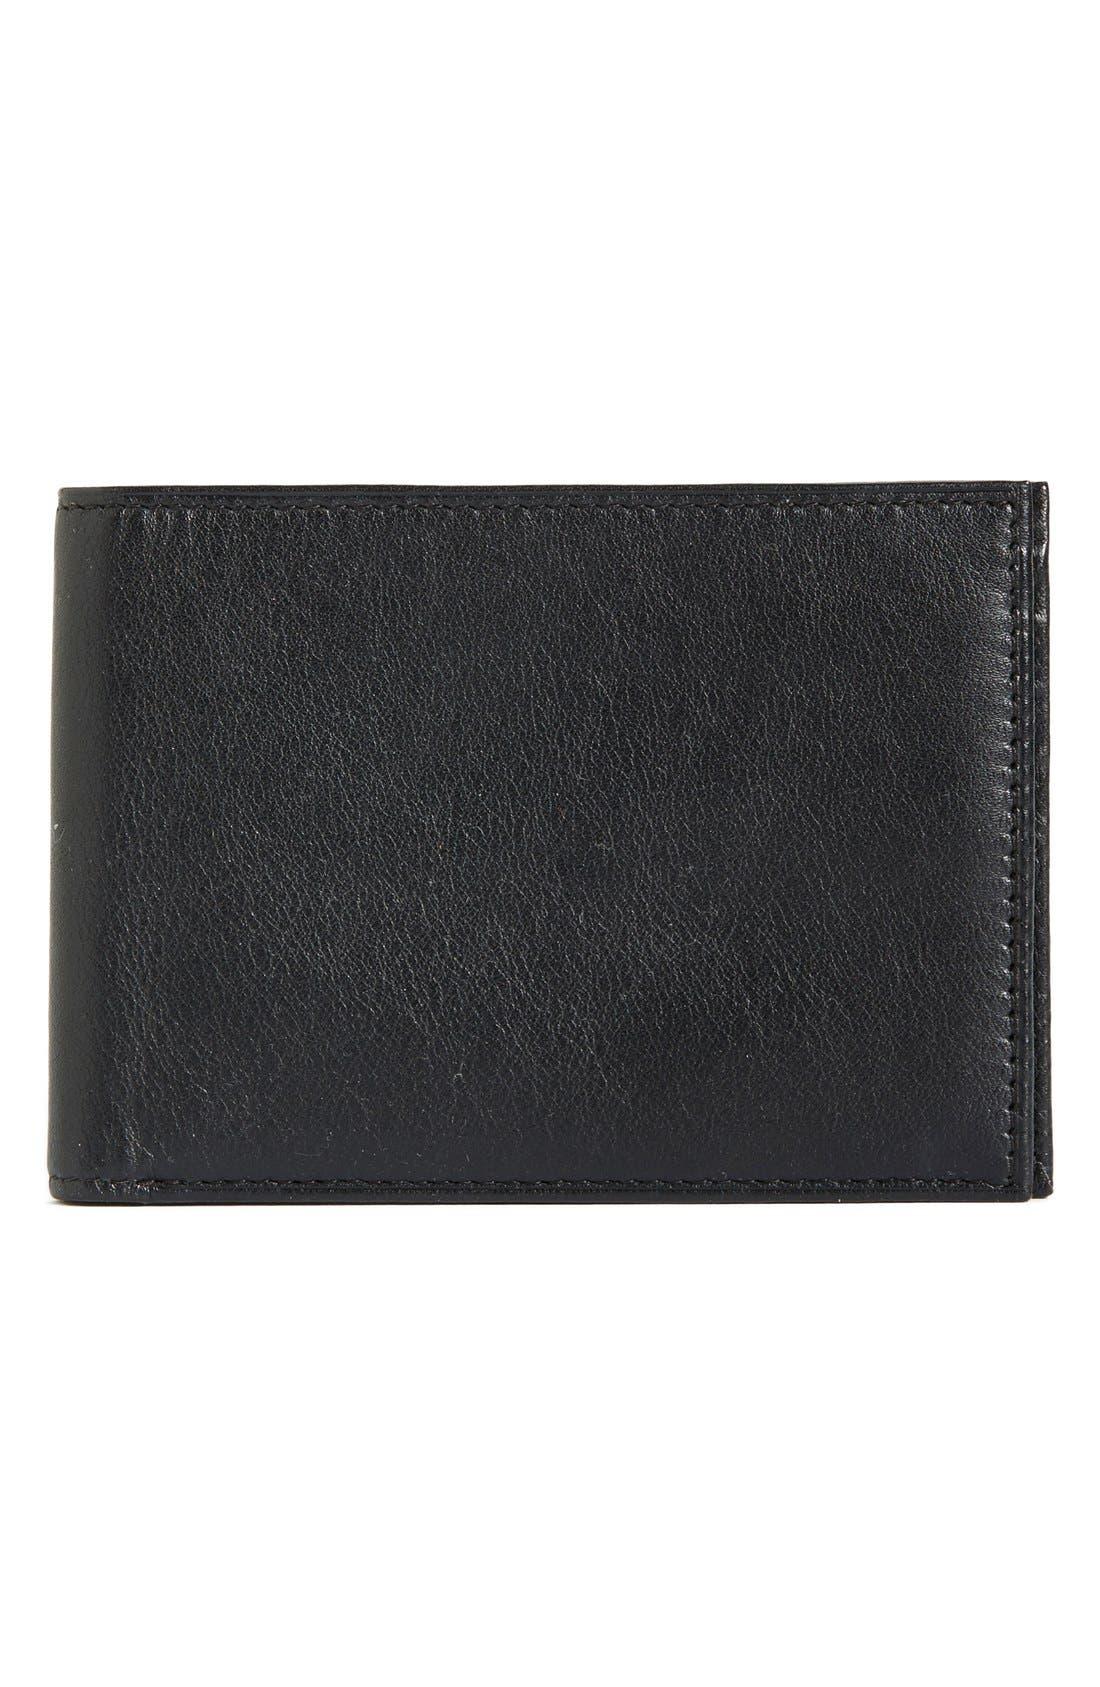 Id Passcase Wallet